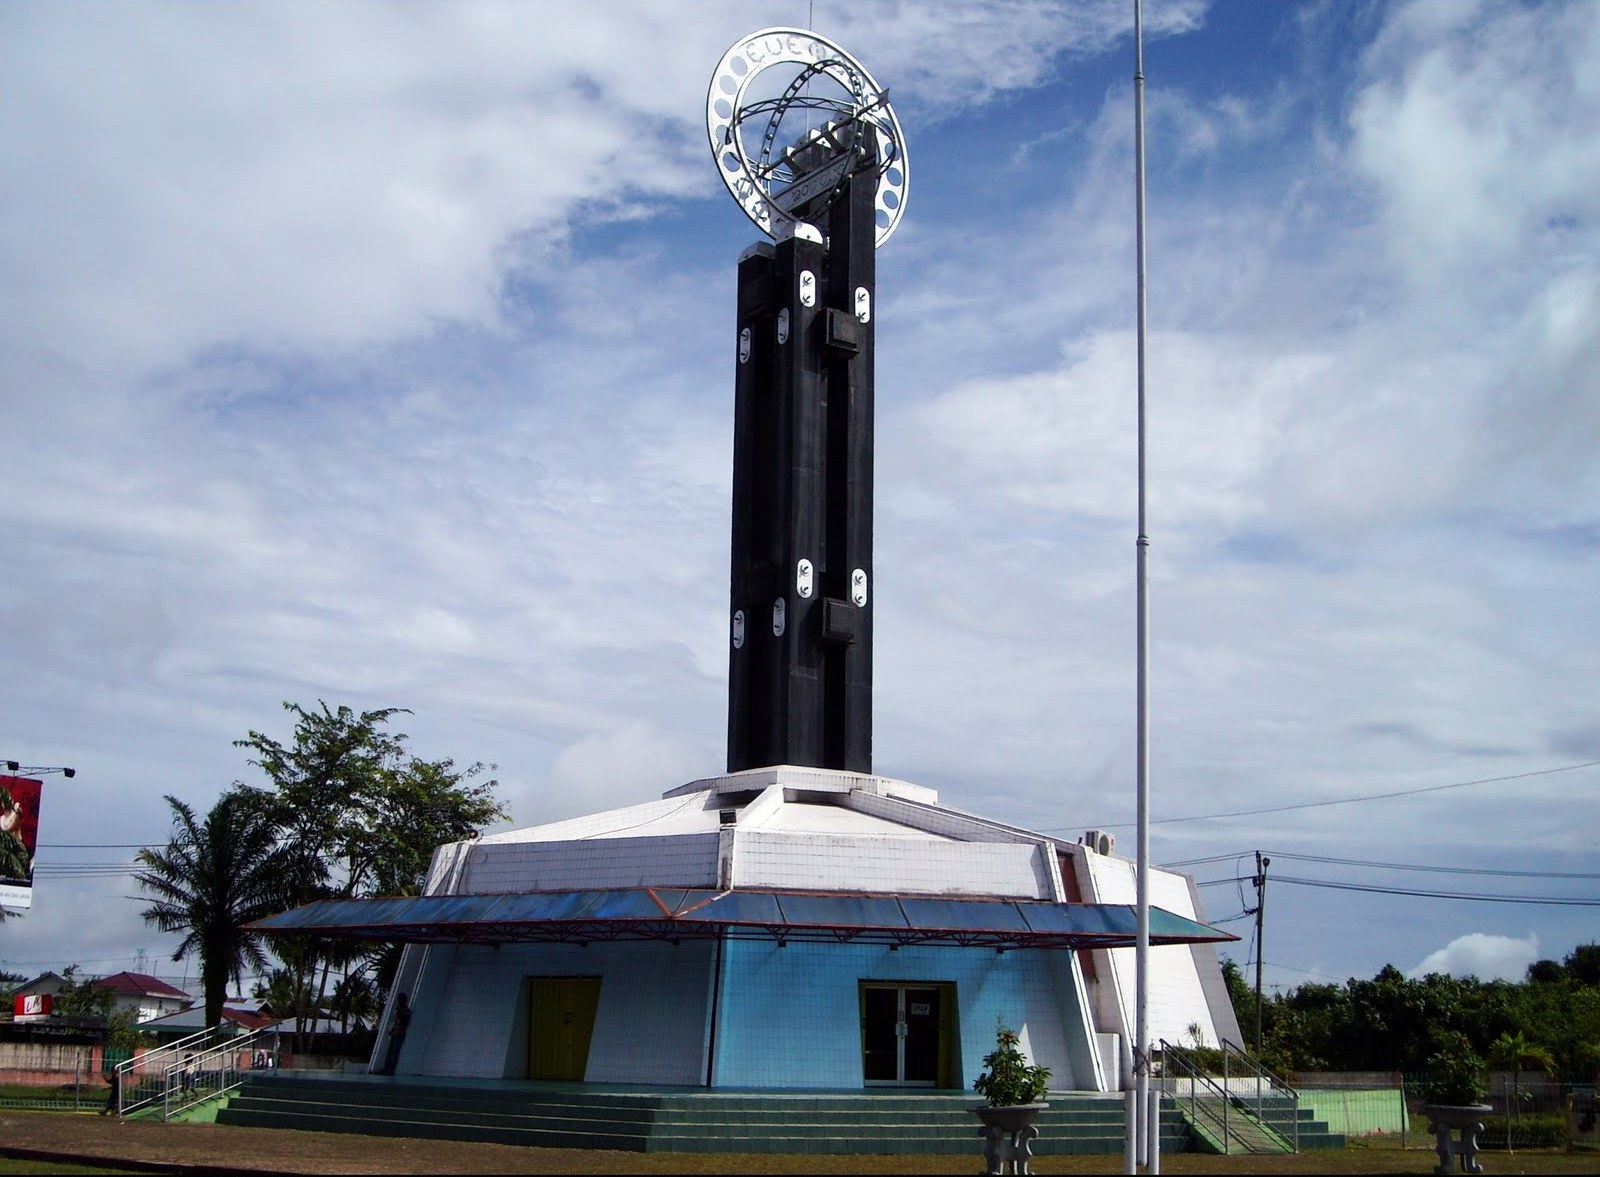 Berdiri Bawah Matahari Tugu Khatulistiwa Kalimantan Barat Kab Pontianak